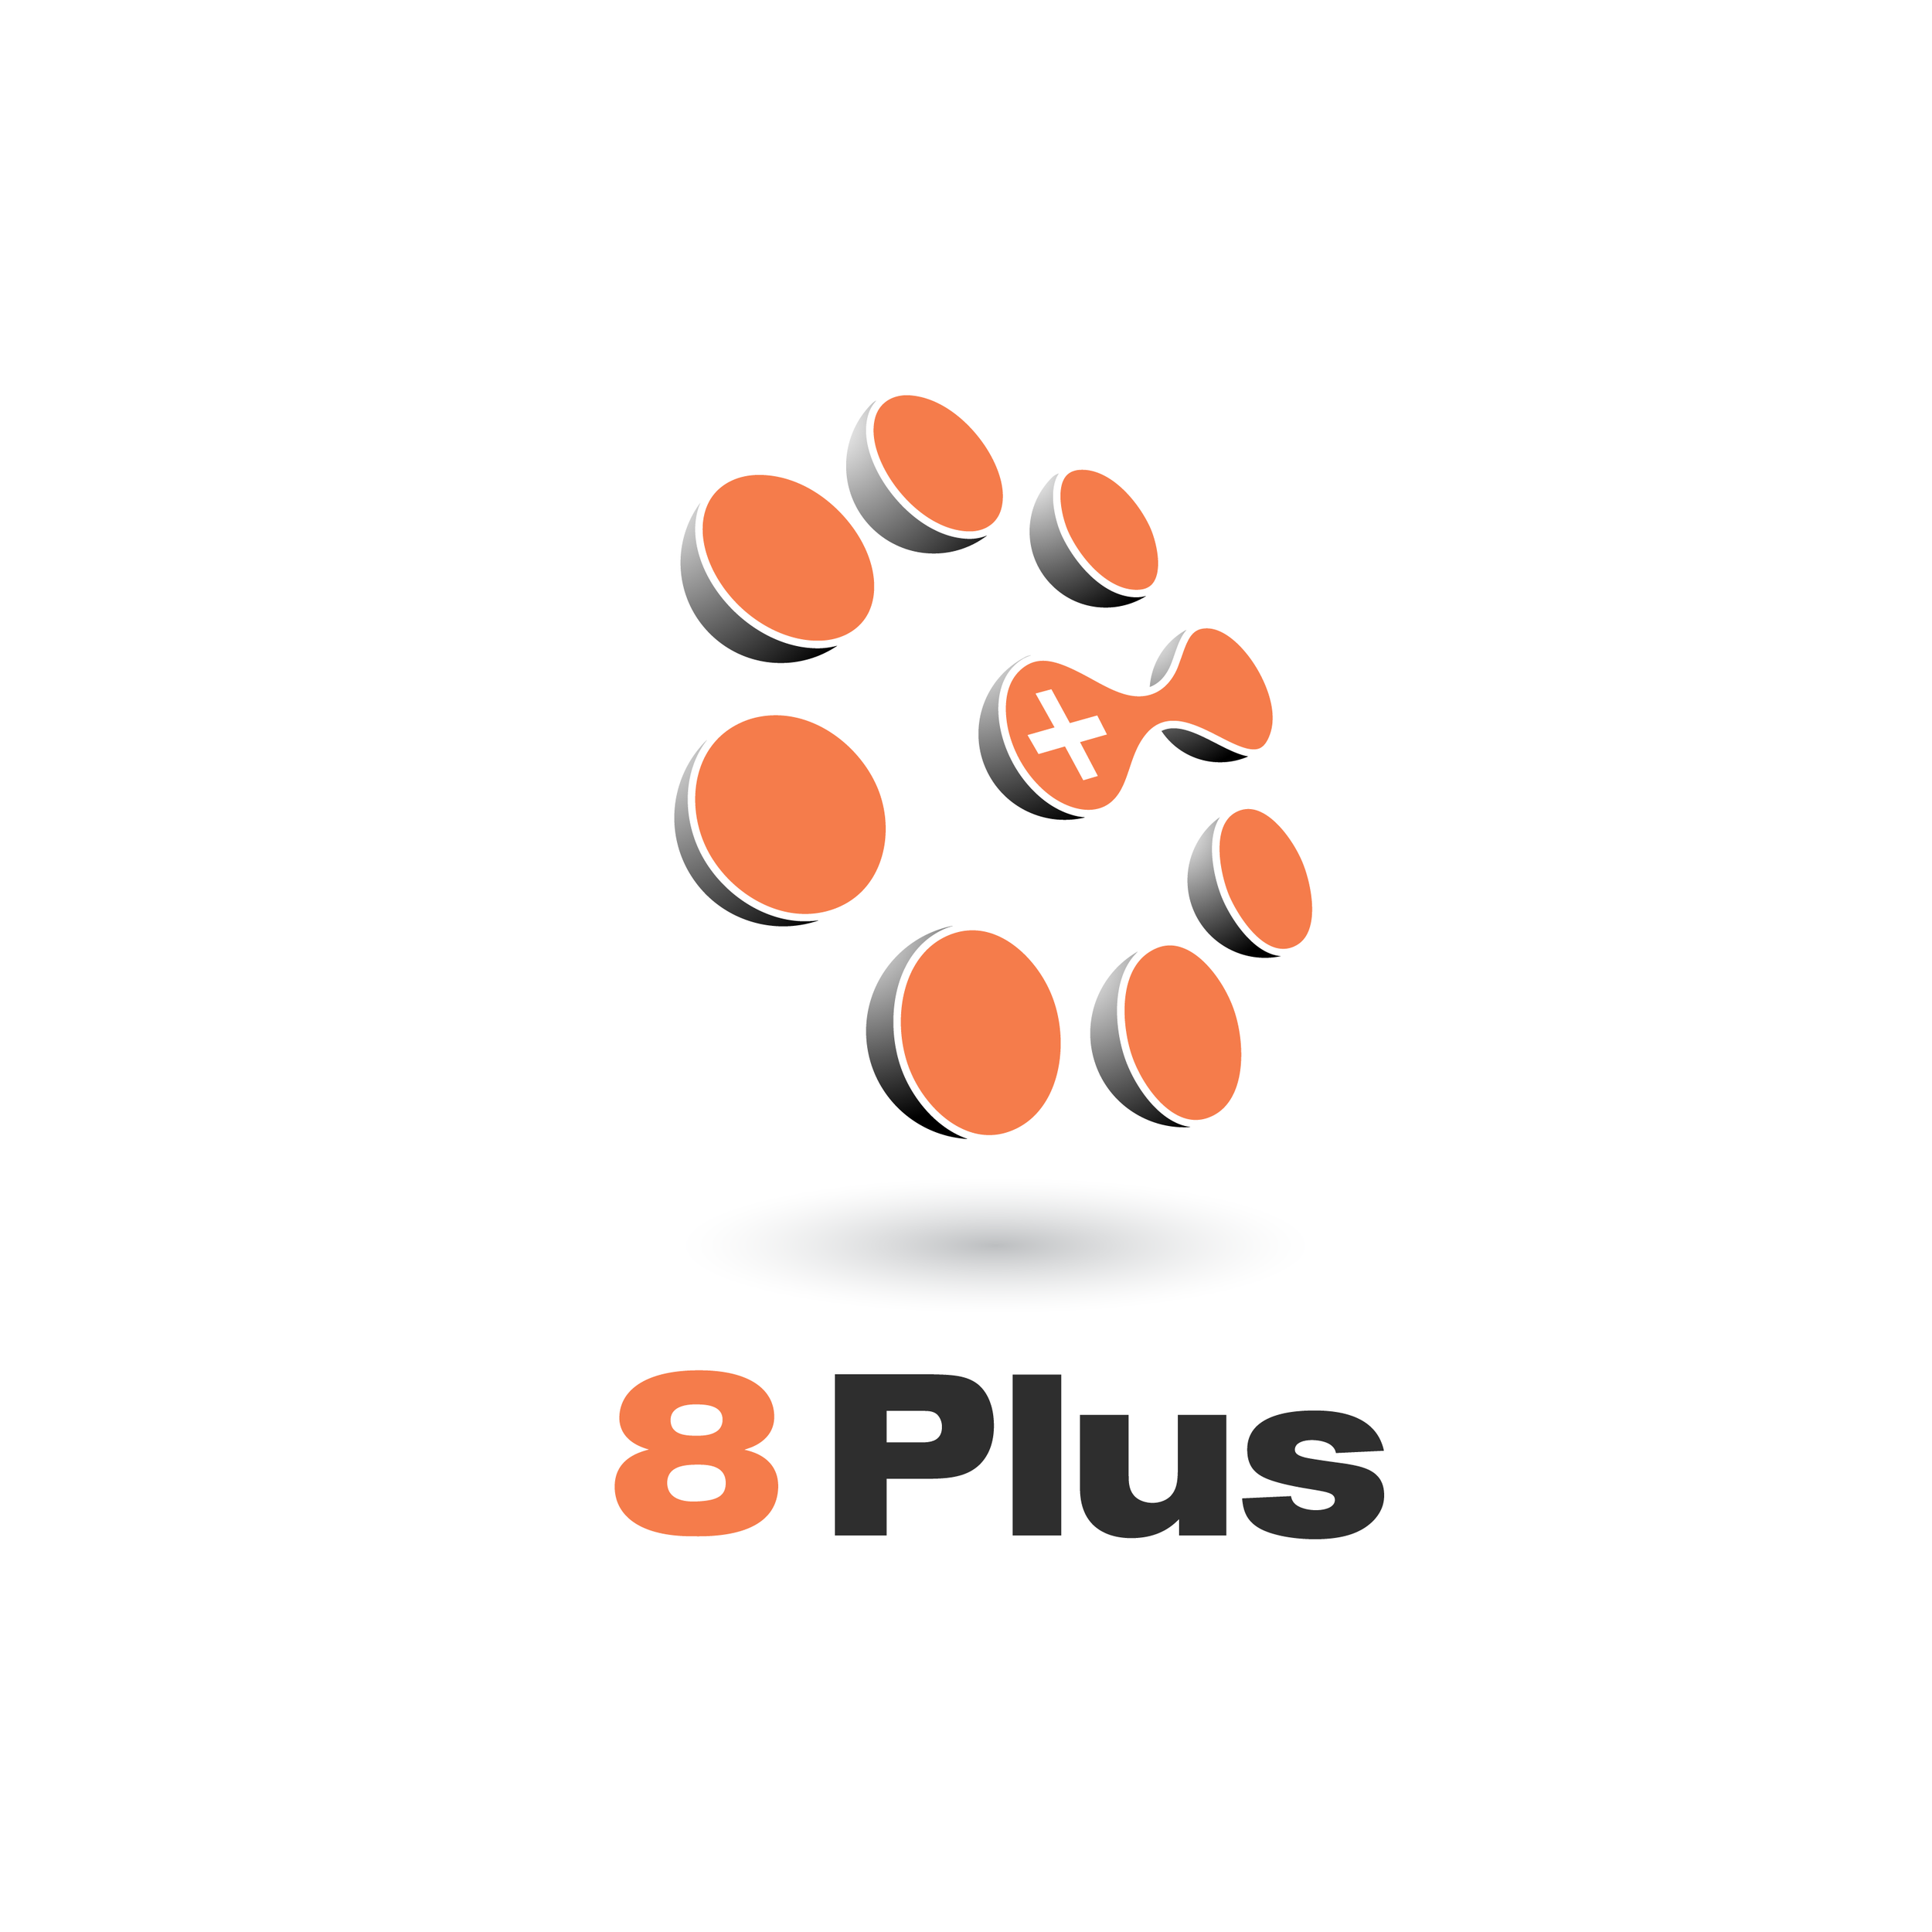 8_plus.png